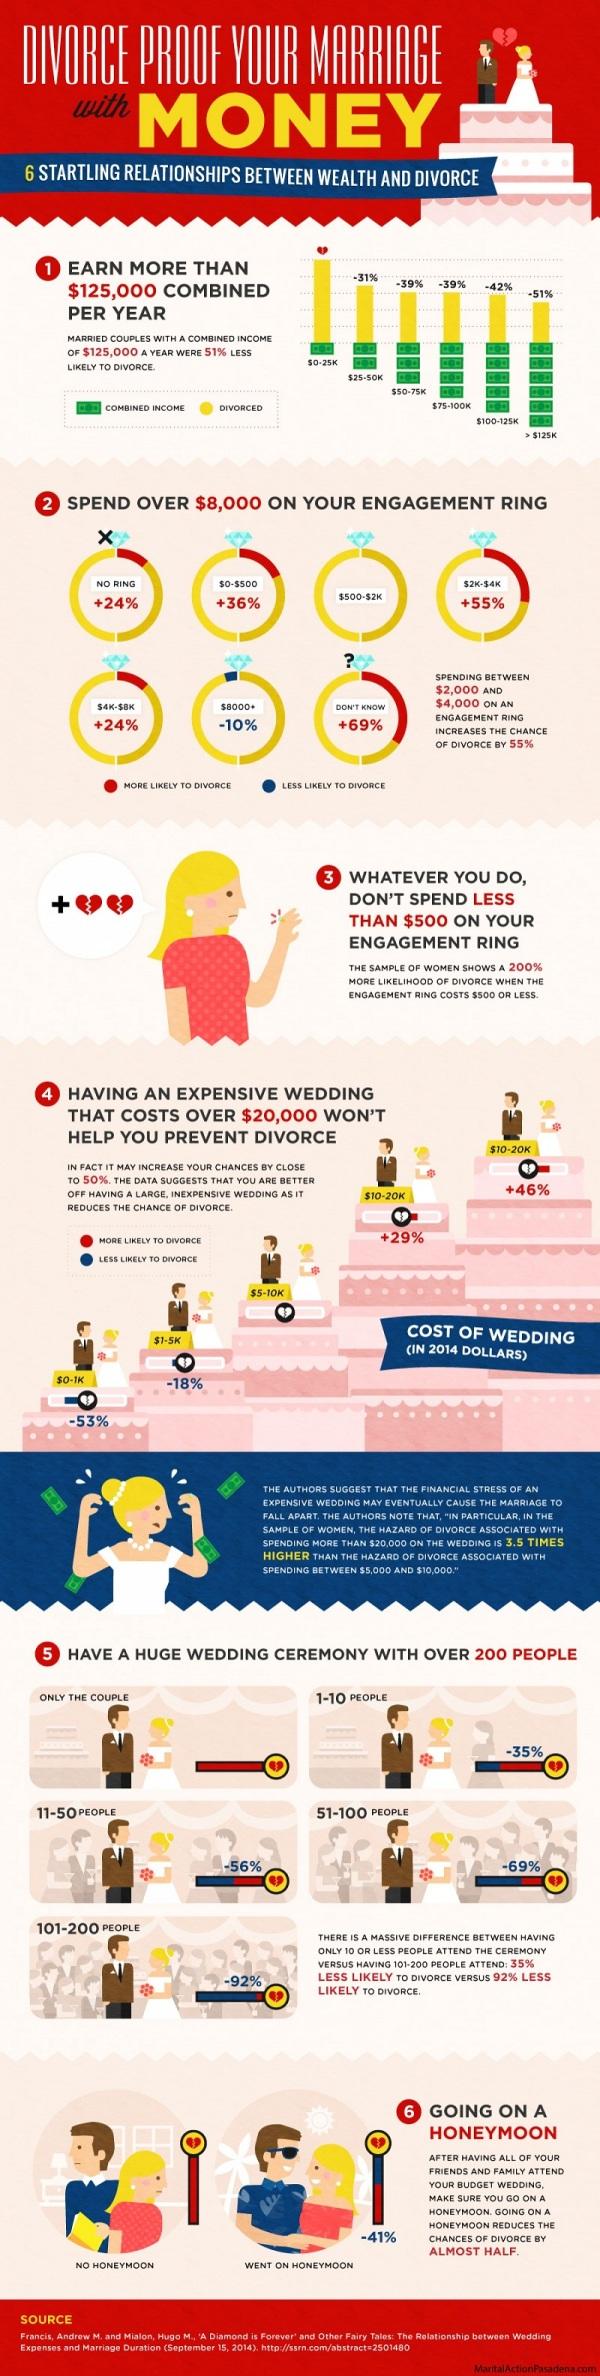 IG spending habits that lead divorce